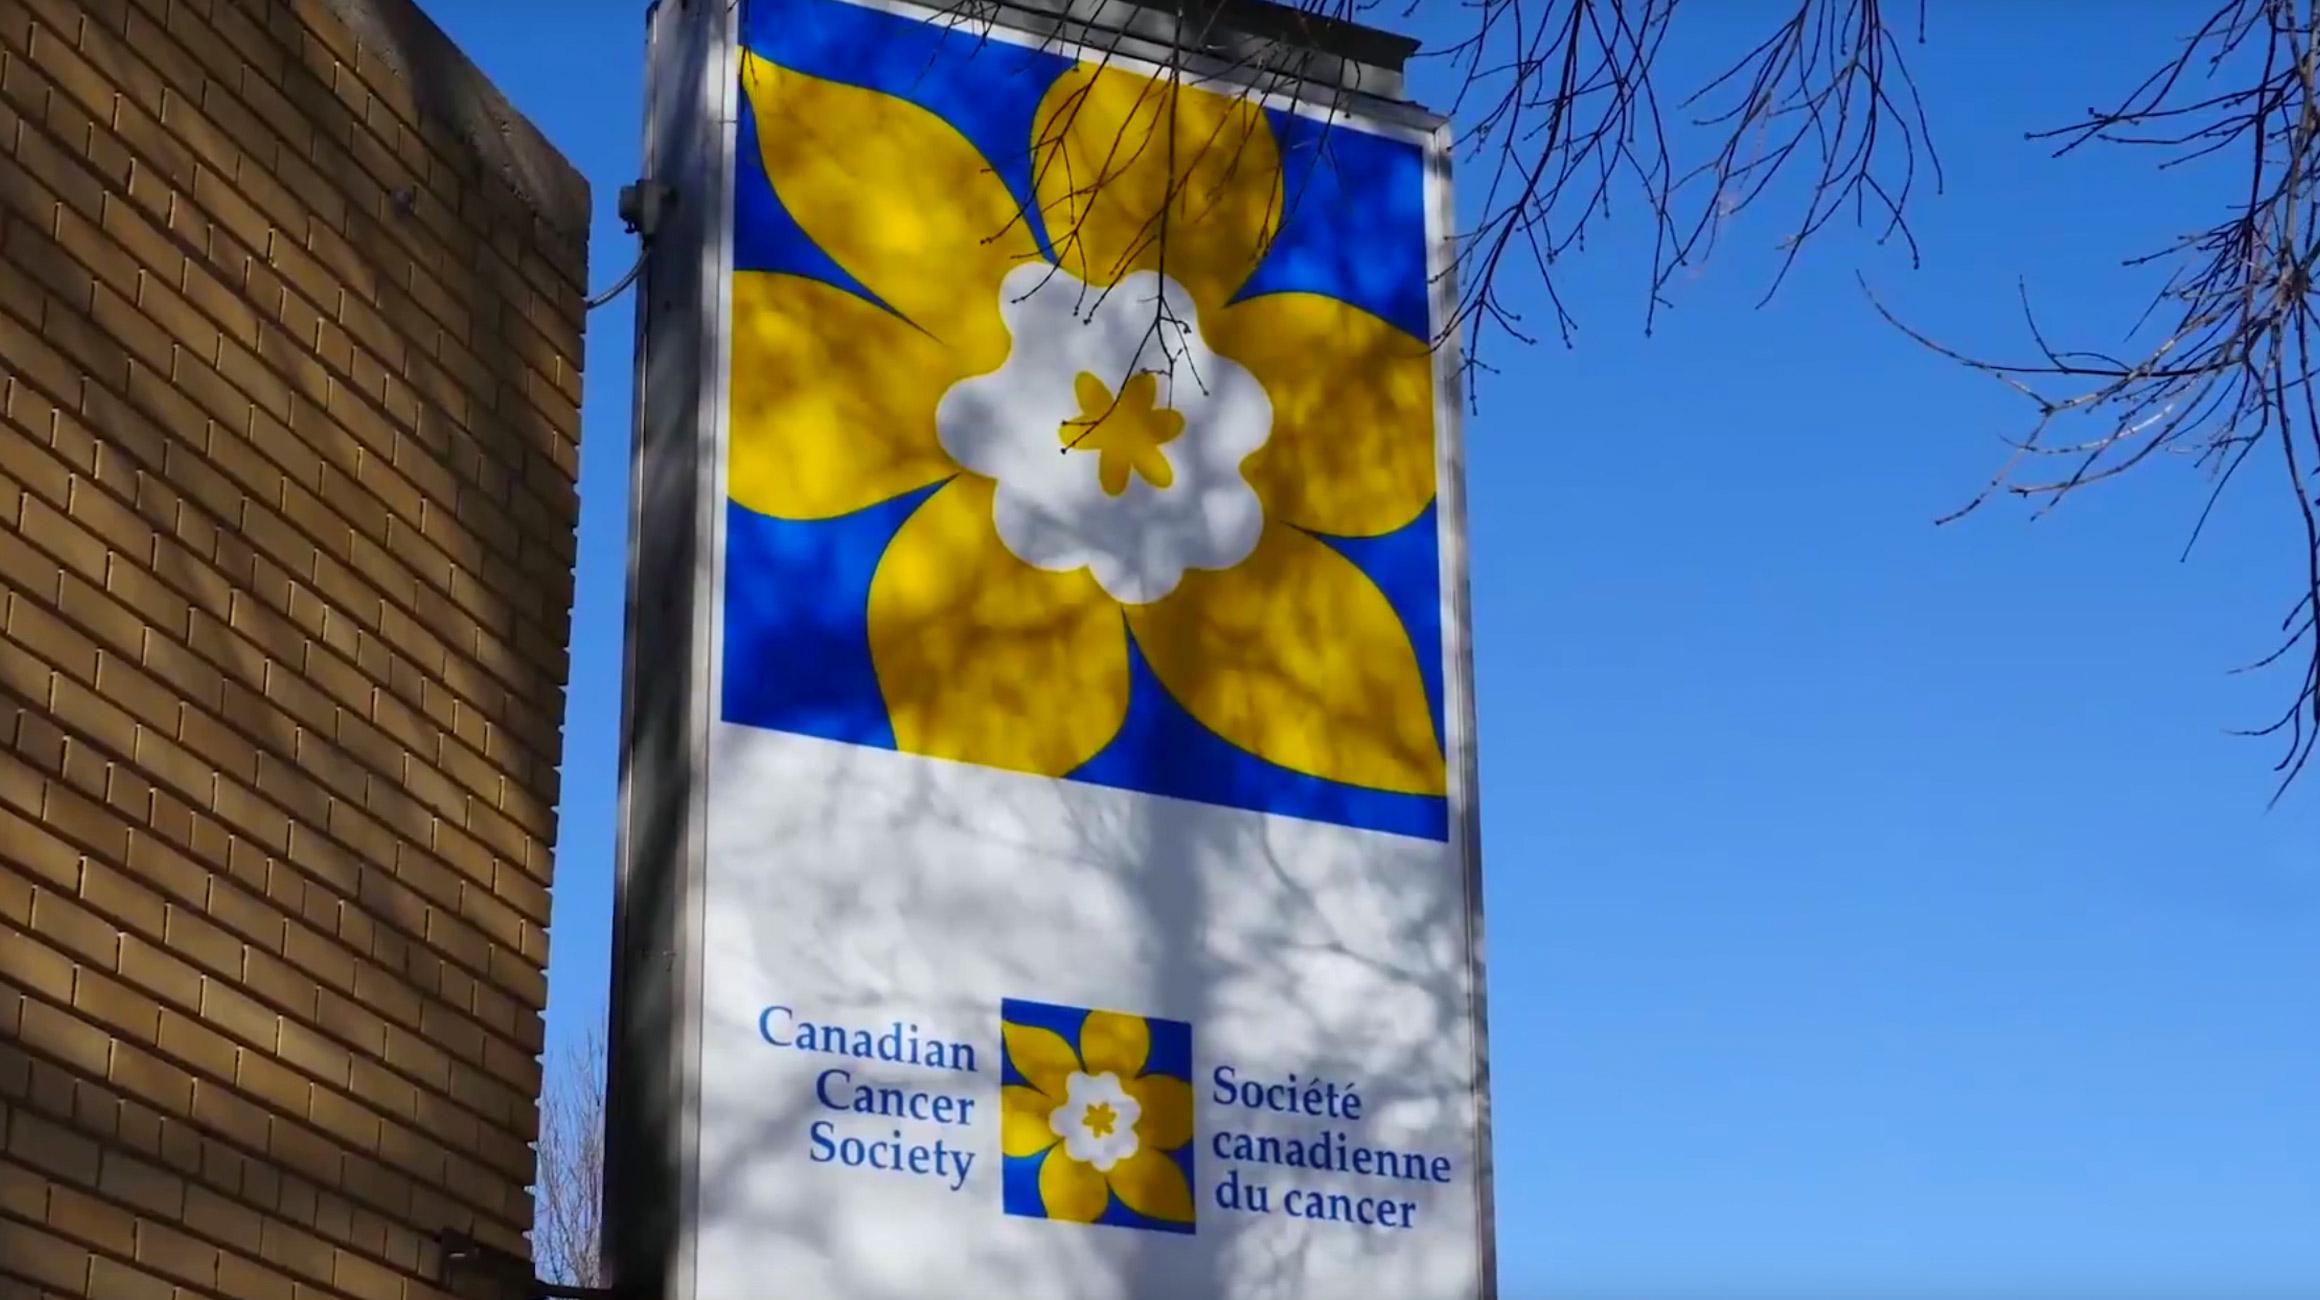 Canadian Cancer Society in Saskatchewan